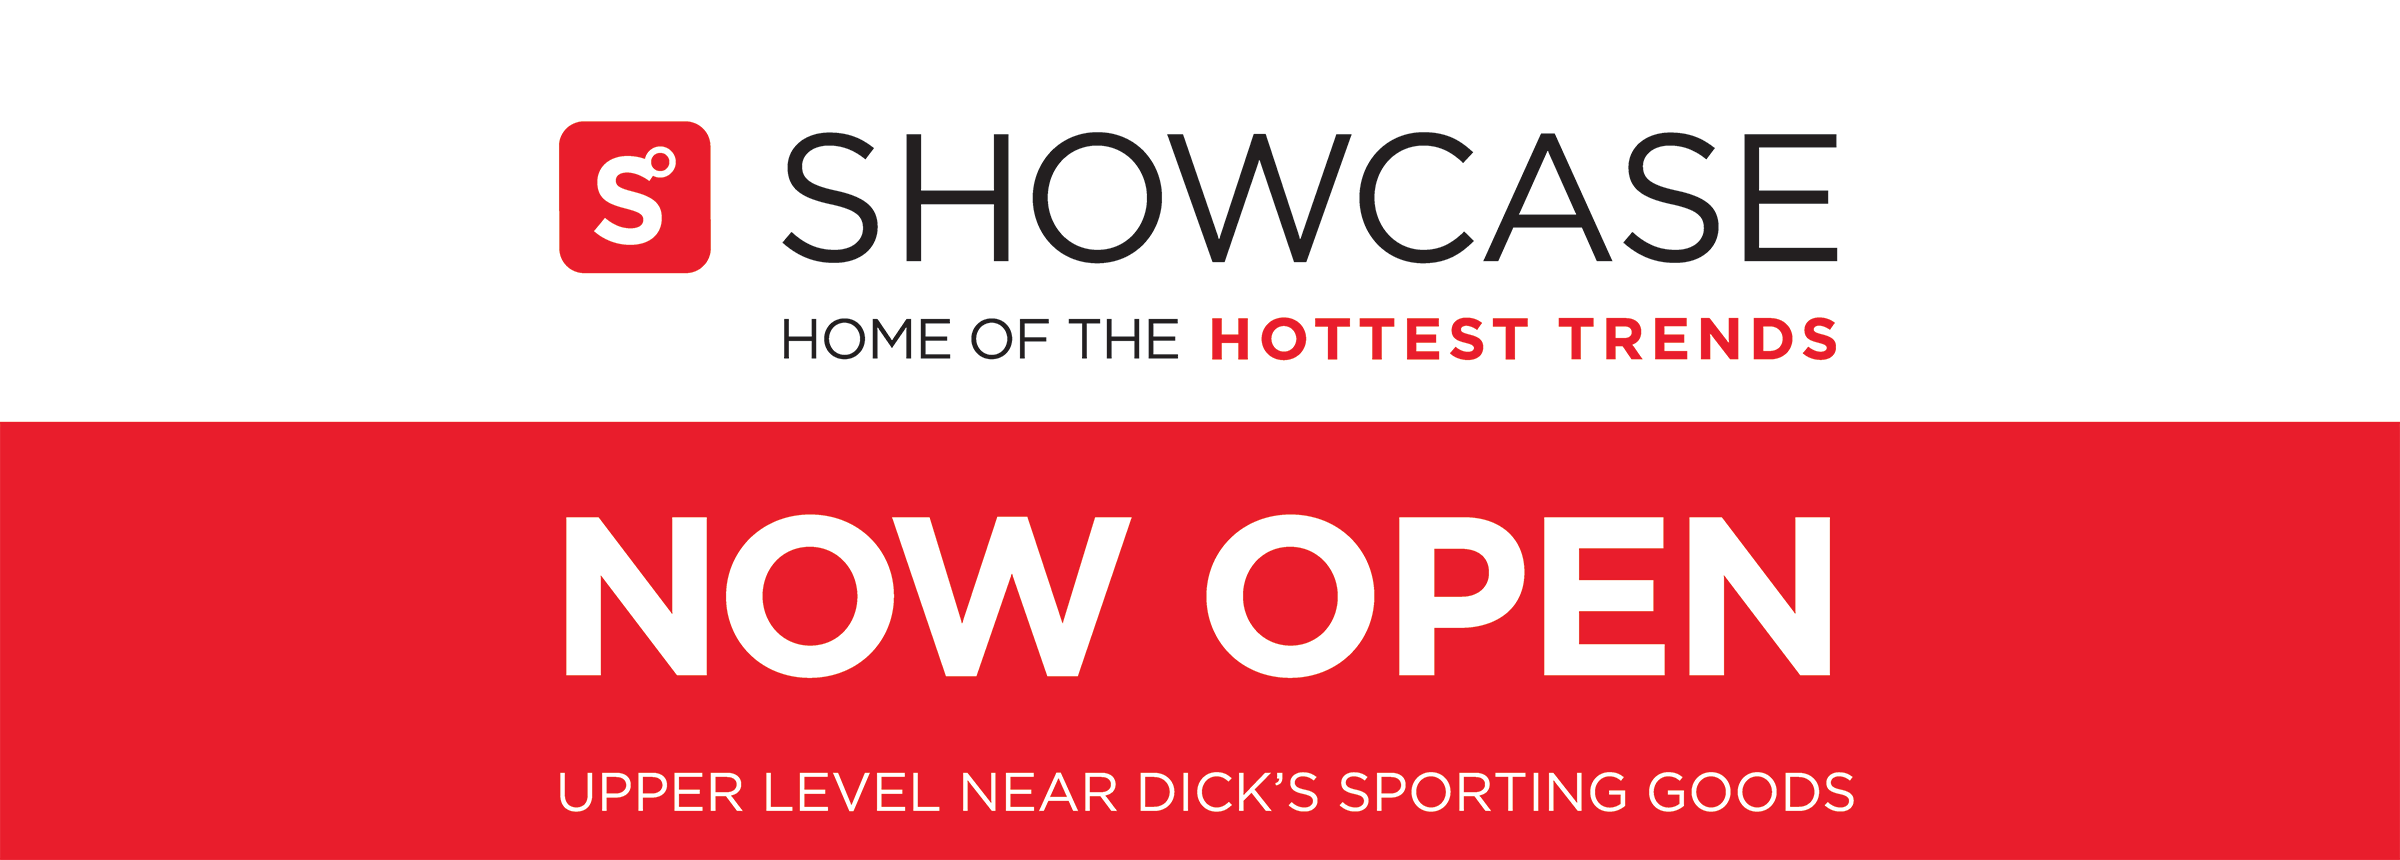 Showcase_Now Open_Website Hero Image_2400x860